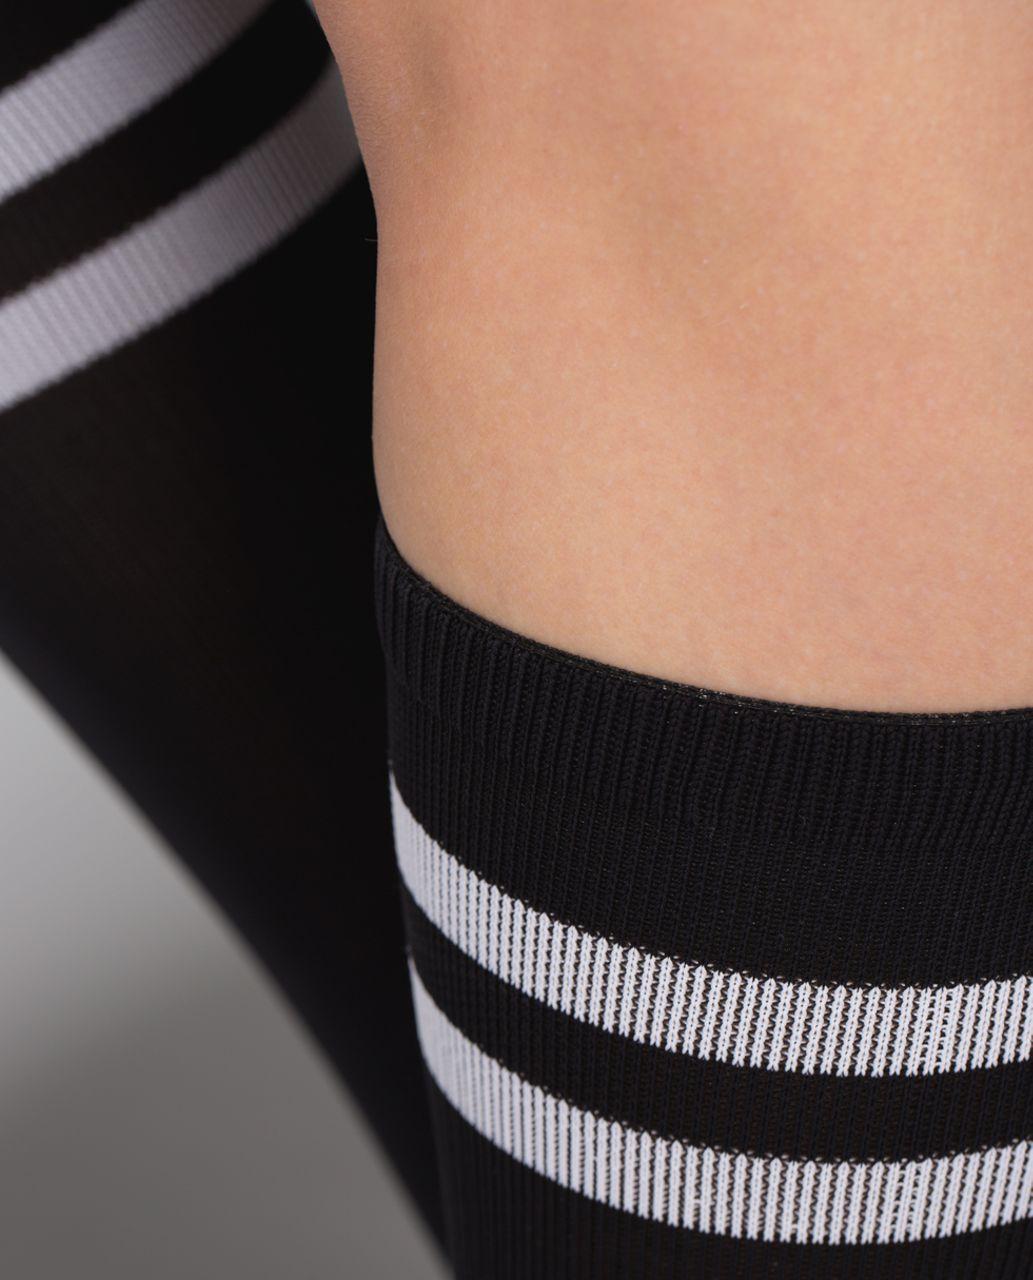 Lululemon Women's Keep It Tight Sock - Varsity Stripe Black White